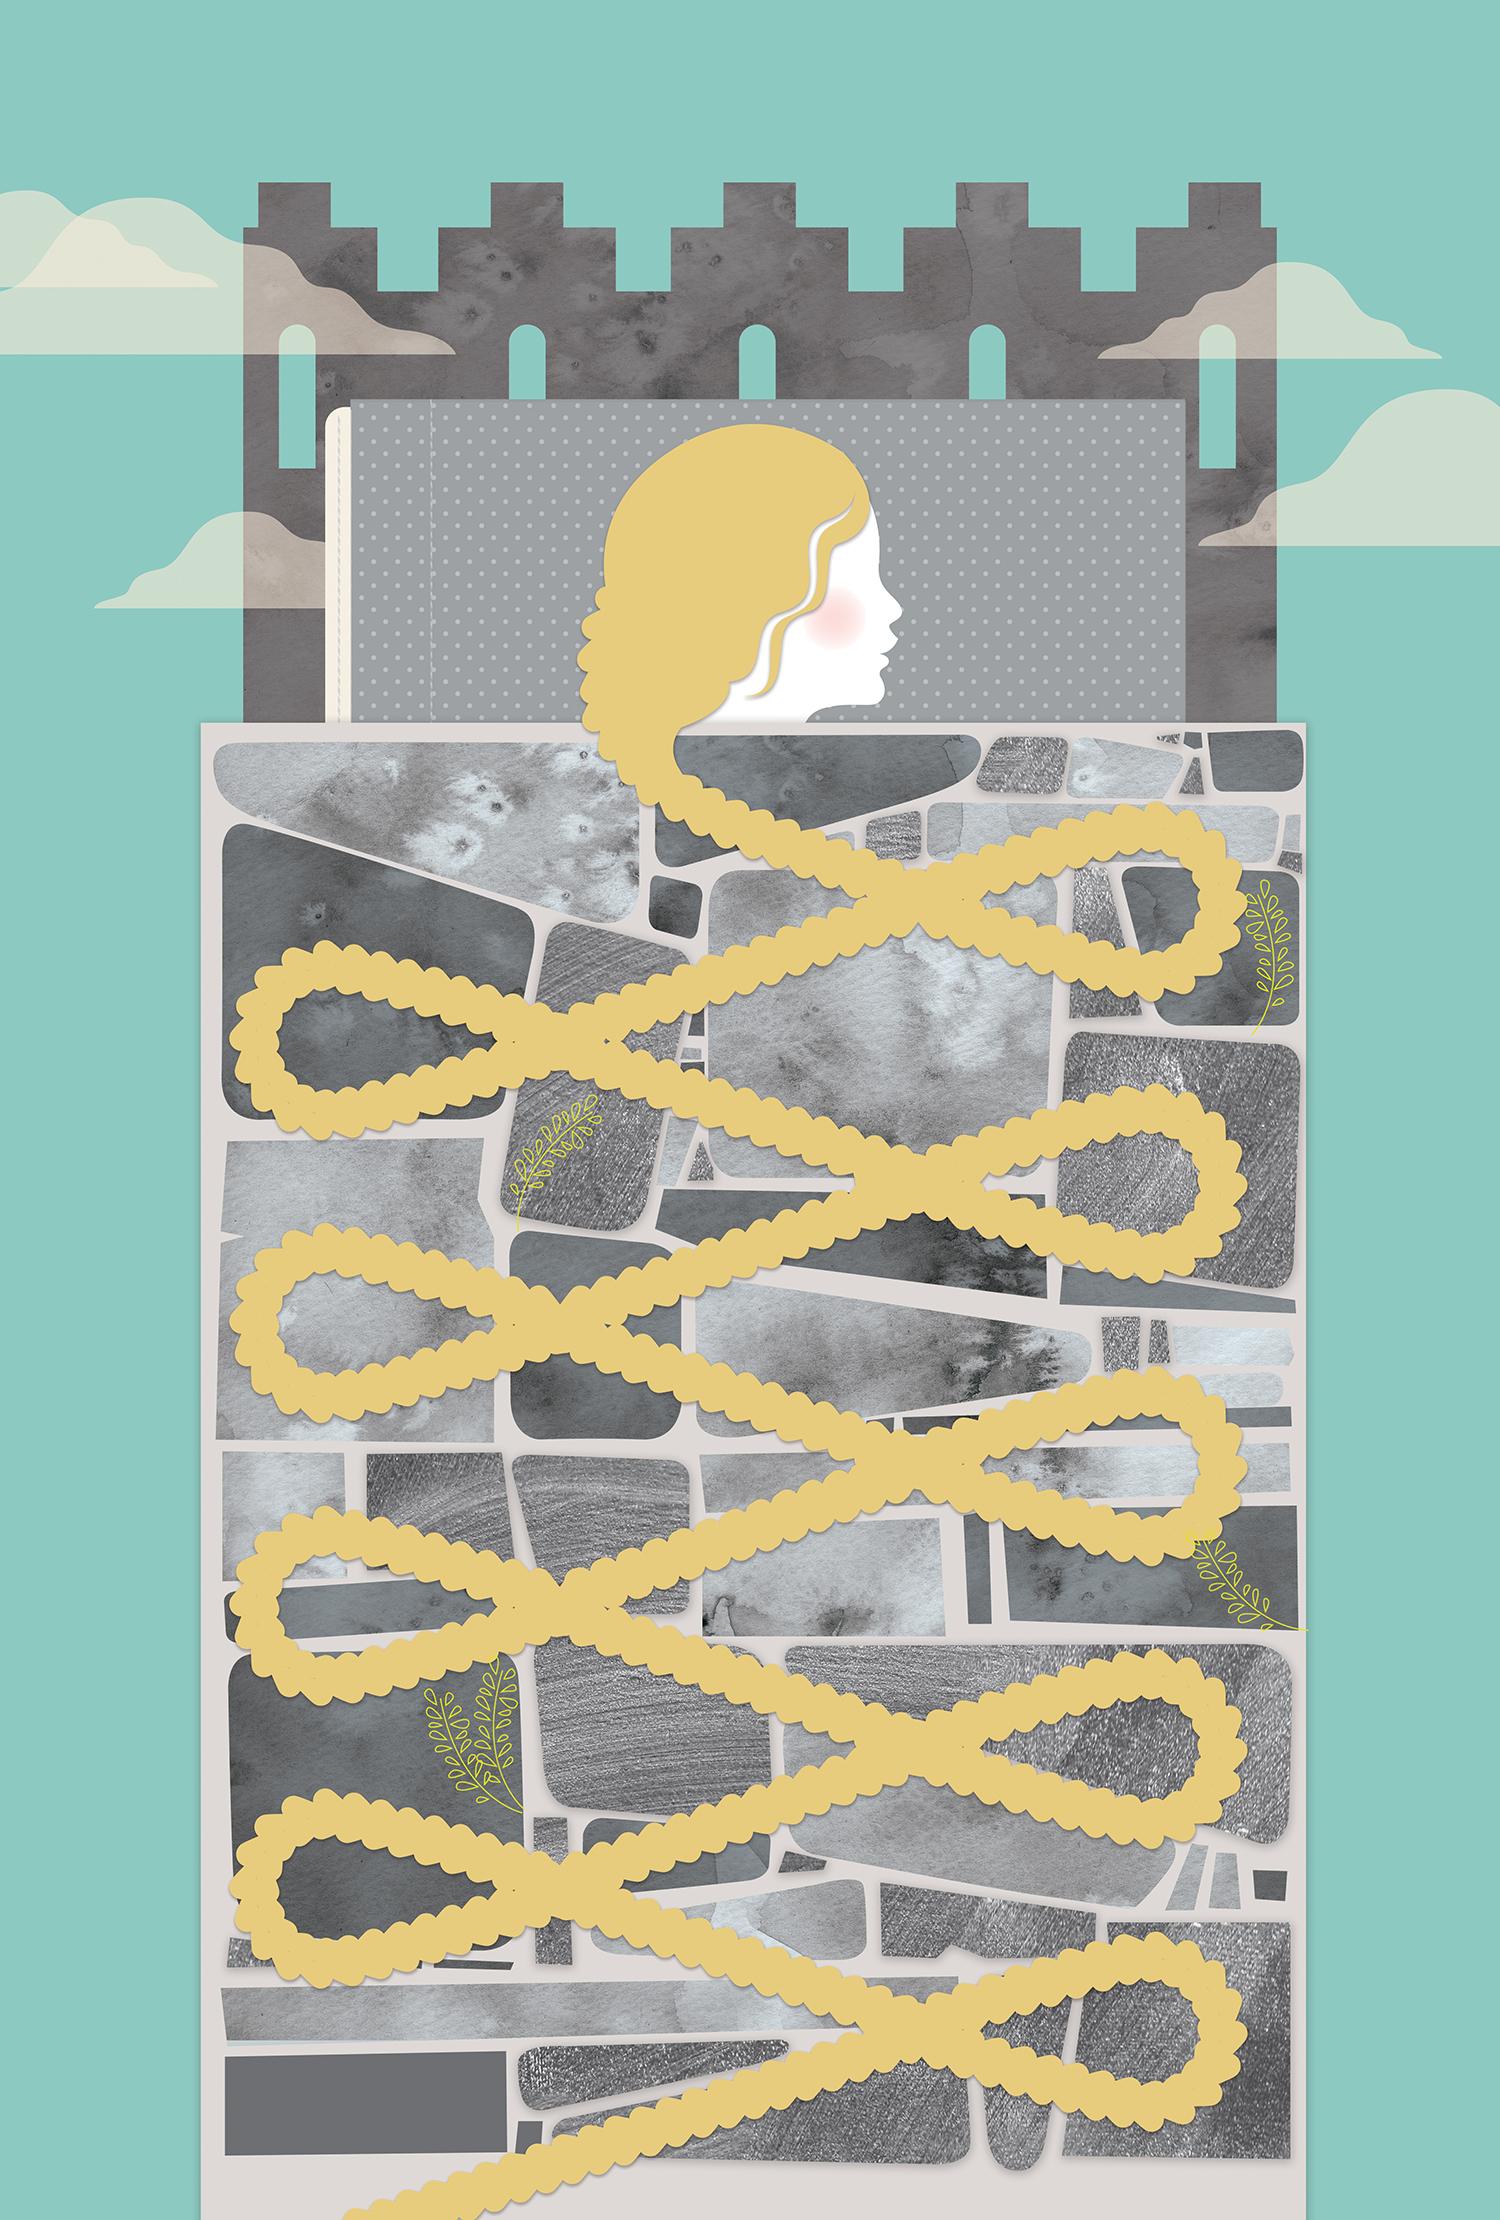 SOI 58 2015 - ARTIST: Eleanor GroschTITLE: Fairy Tale Series [4 of 6]